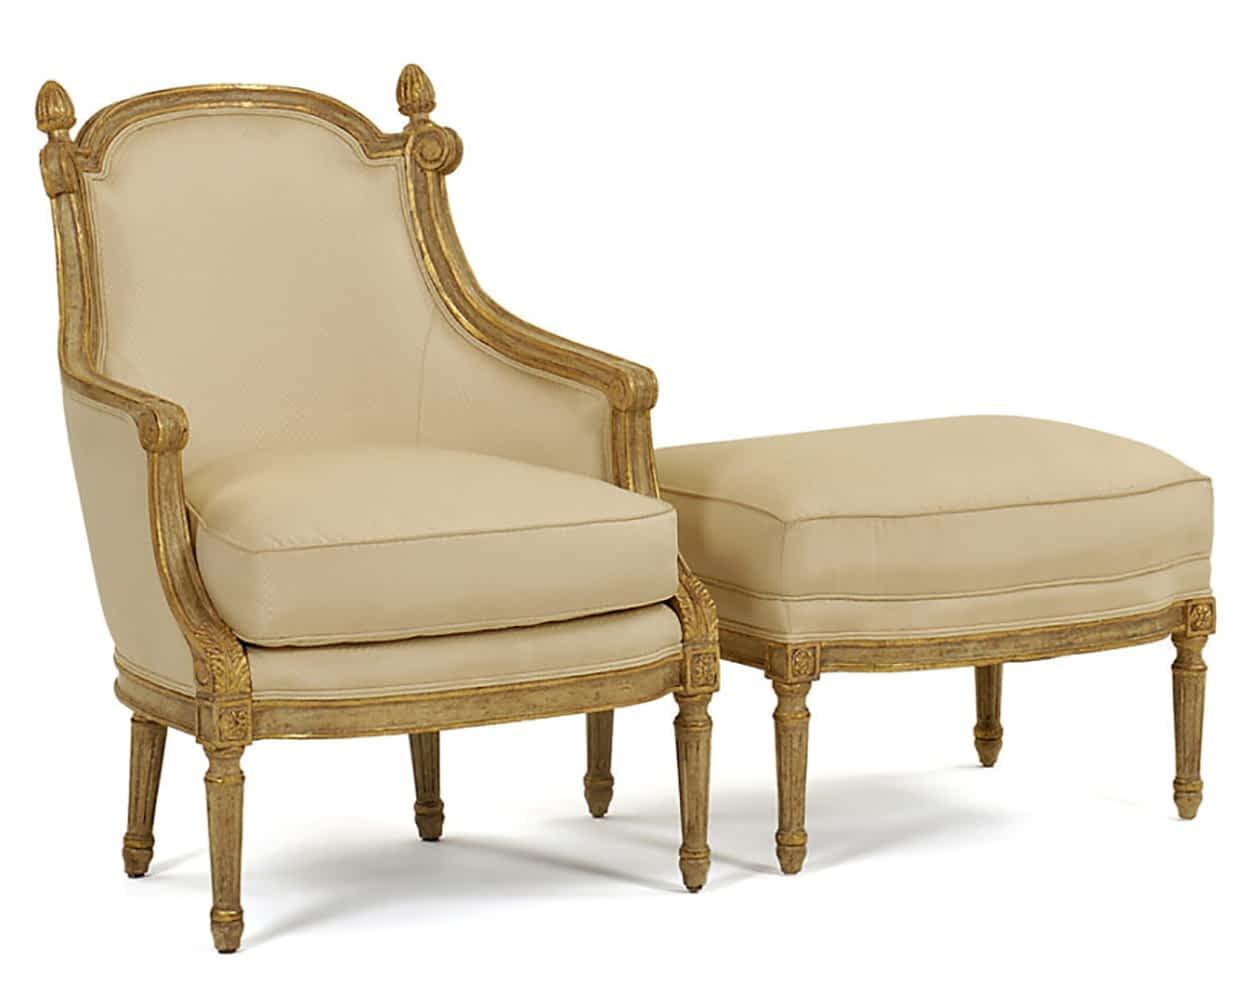 2010-Acorn-Lounge-Ottoman-900×690